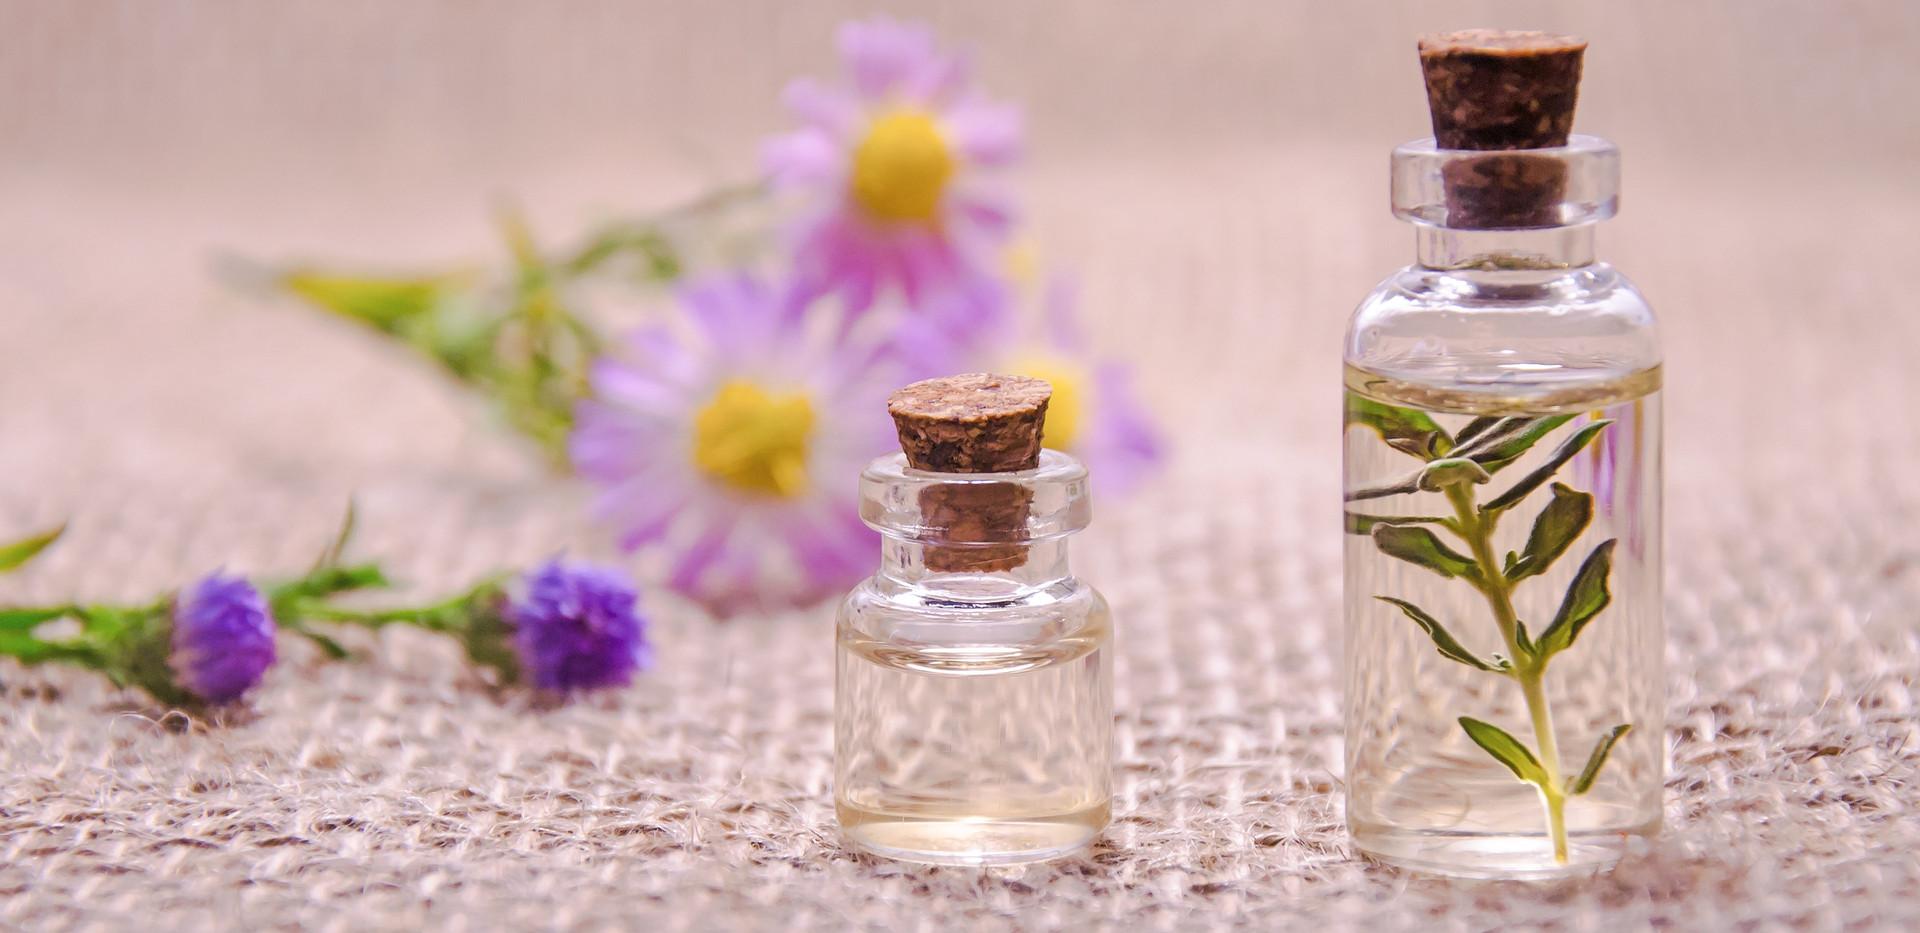 essential-oils-3084952.jpg